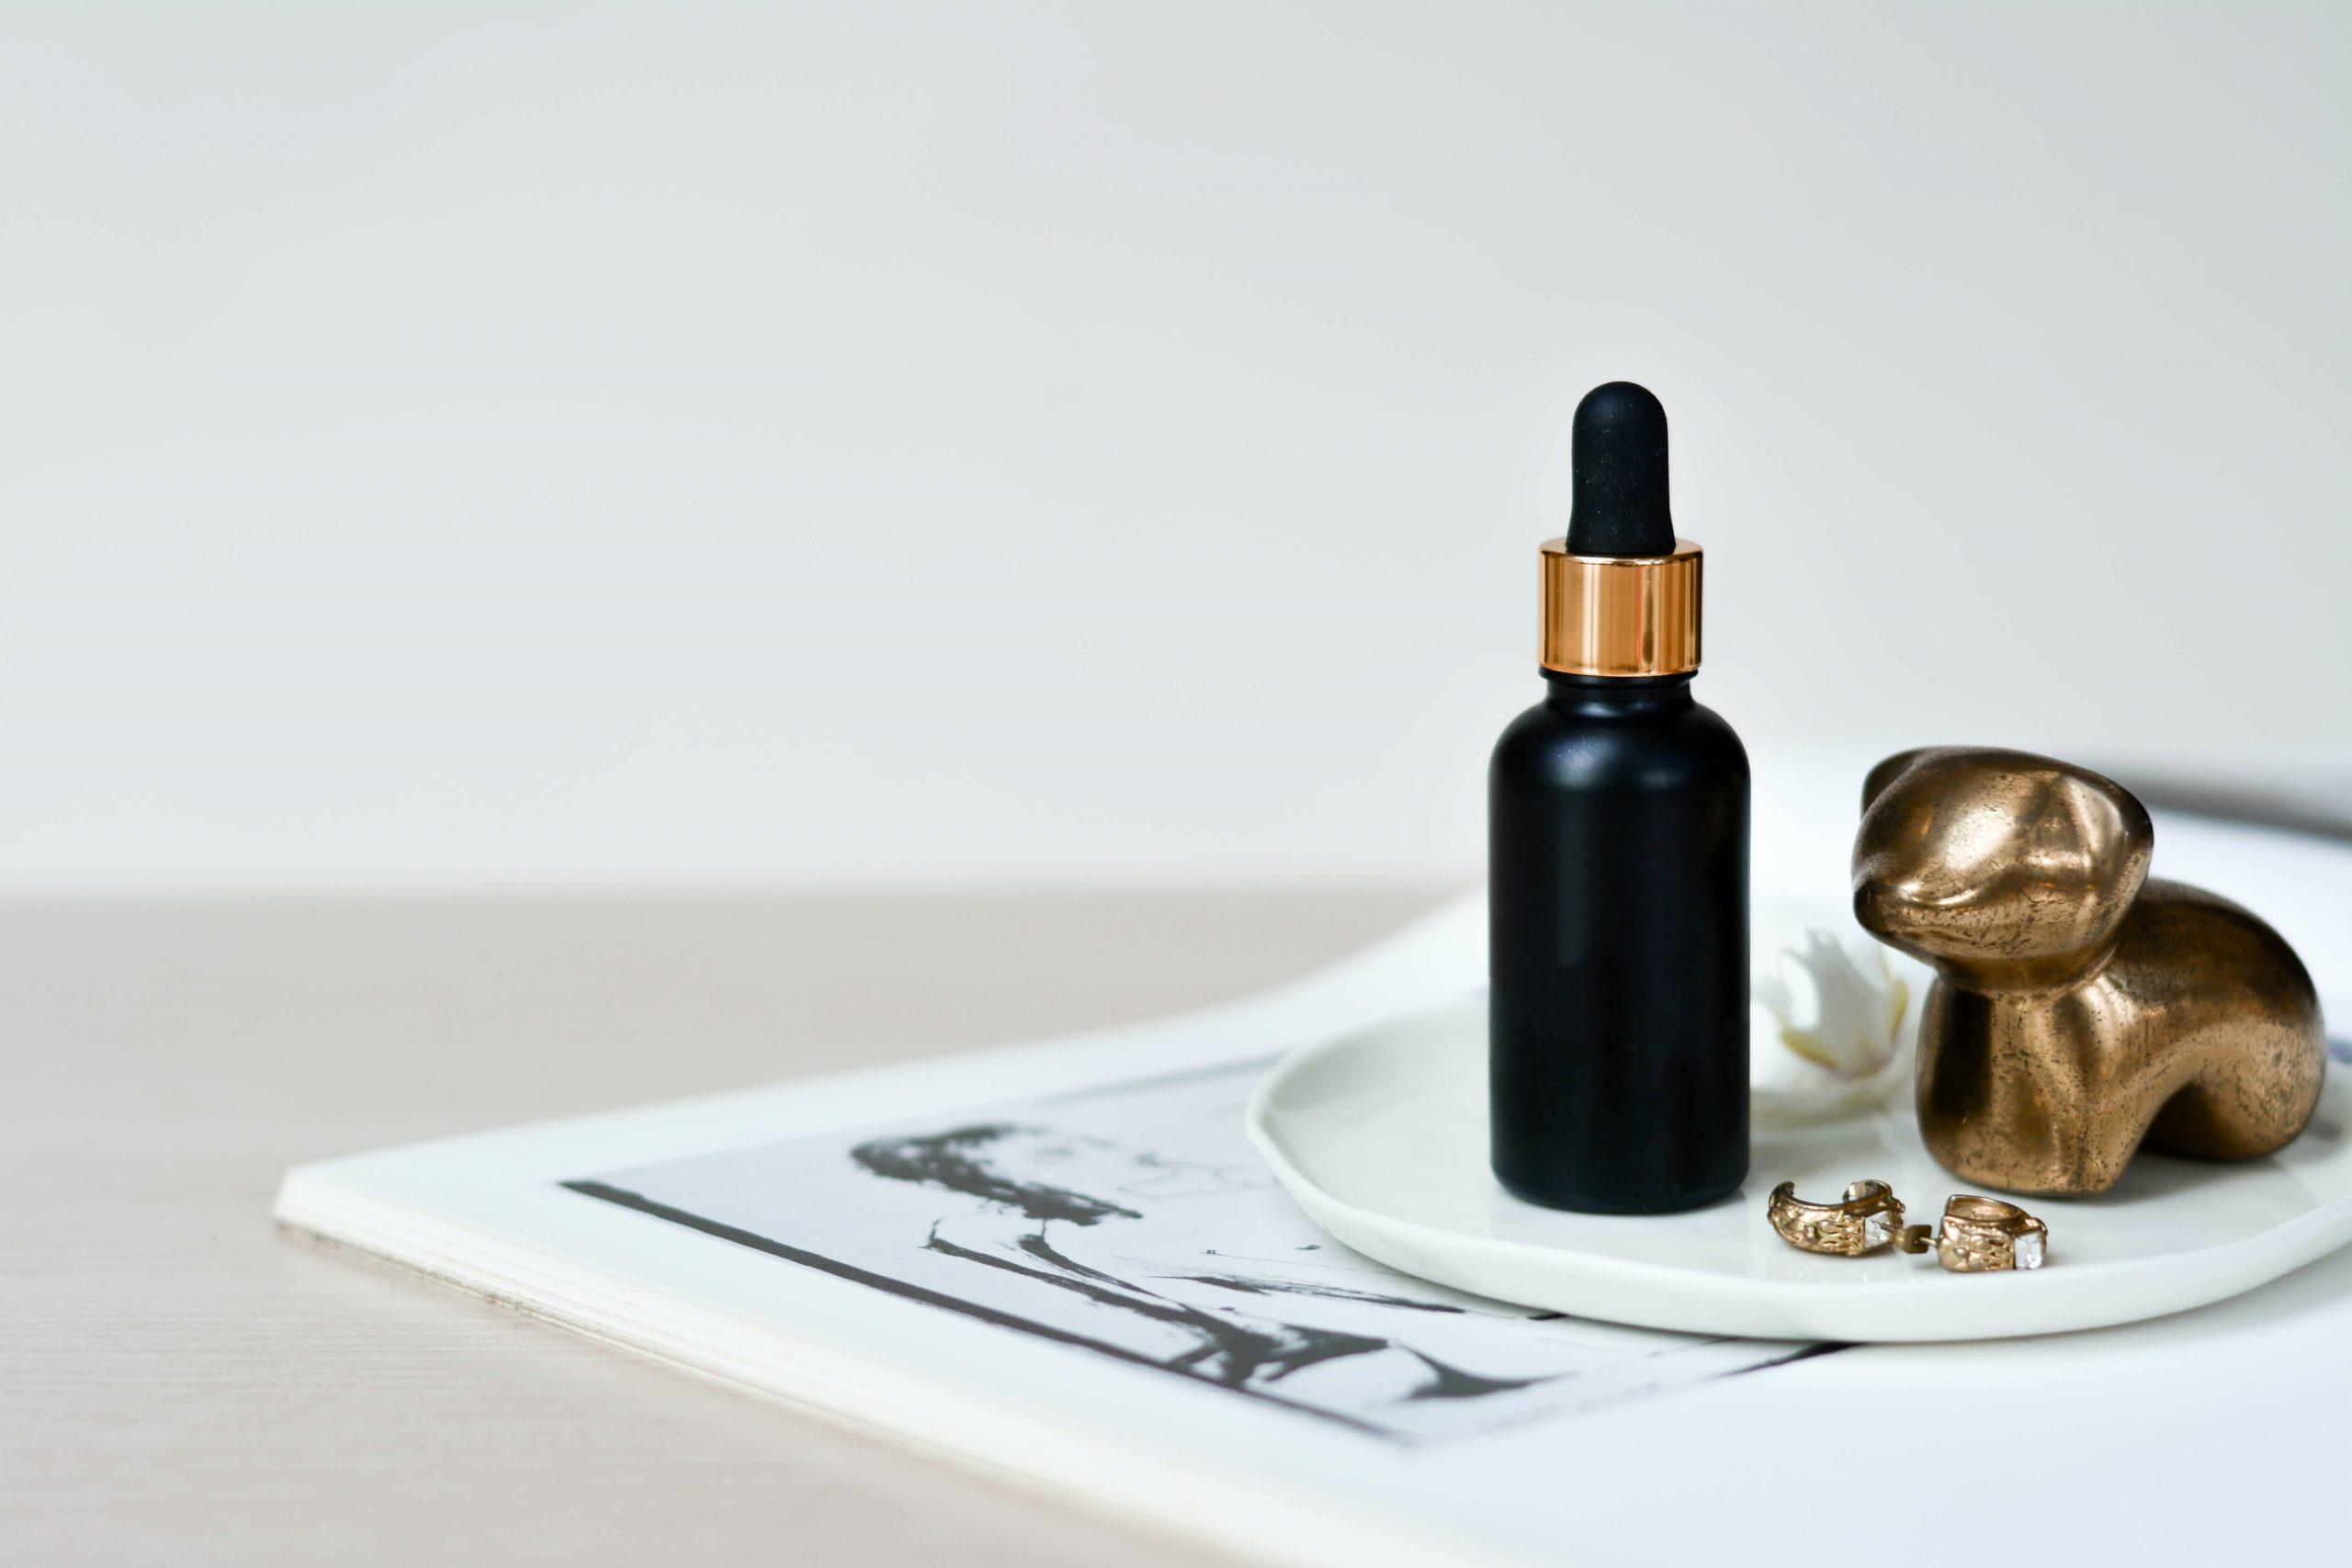 Lactobionic Acid: Bionic Face Cream, Bionic Lotion and Bionic Face Serum